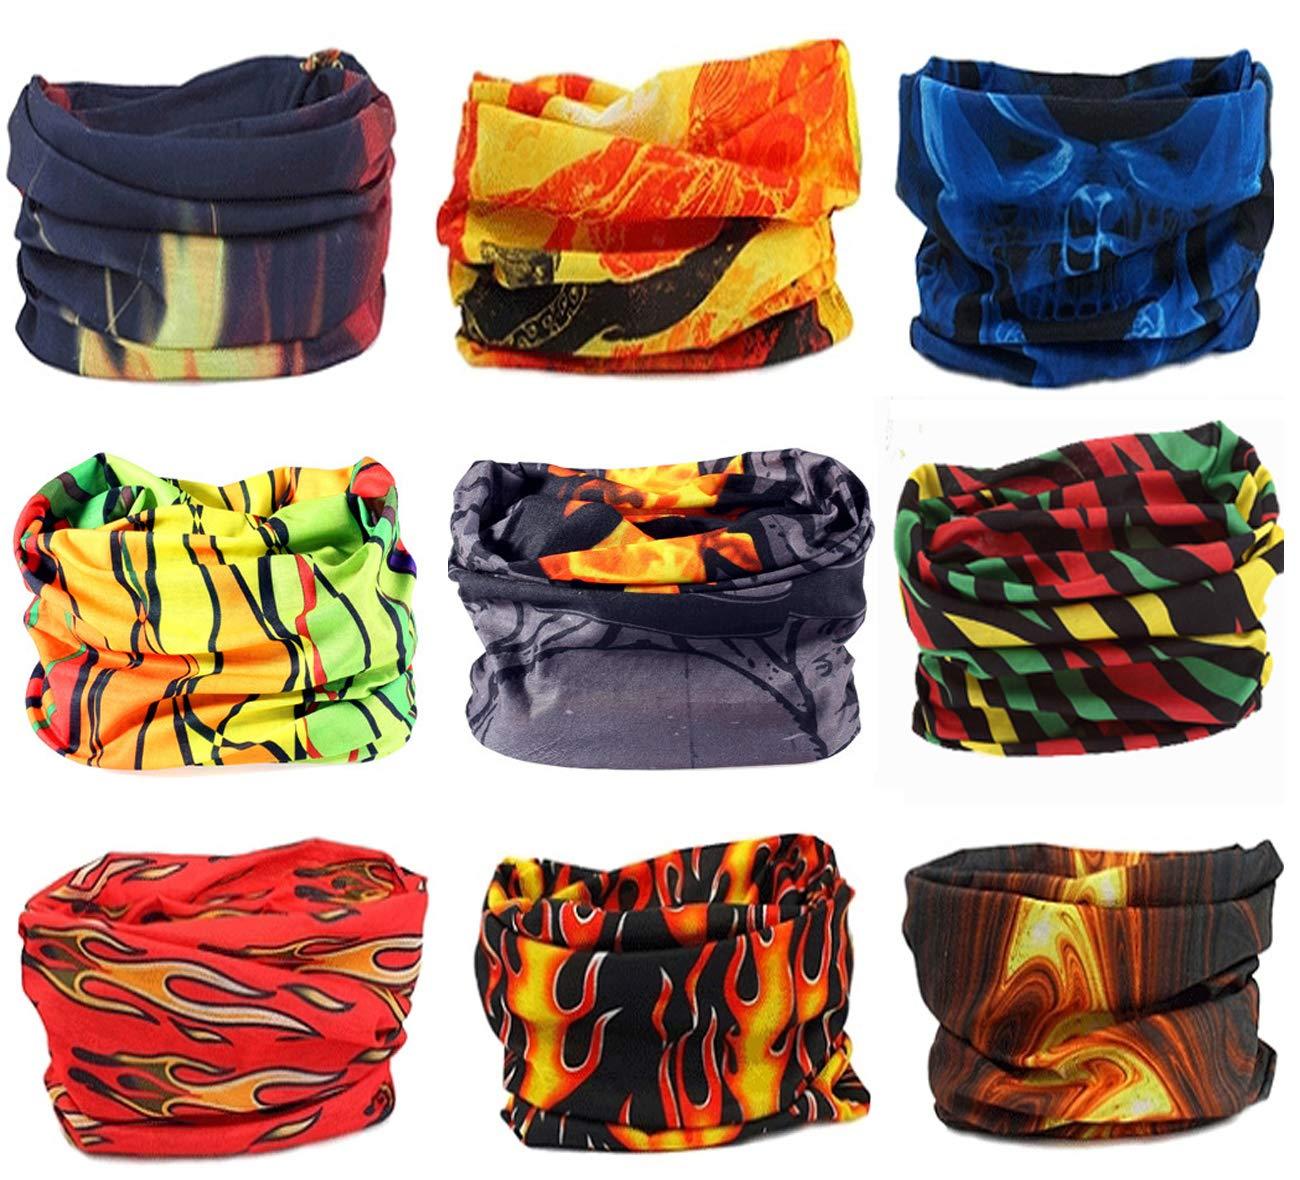 KINGREE 9PCS Headbands, Outdoor Multifunctional Headwear, Sports Magic Scarf, High Elastic Headband with UV Resistance, Athletic Headwrap, Mens Sweatband, Womens Hairband (Flame Series)